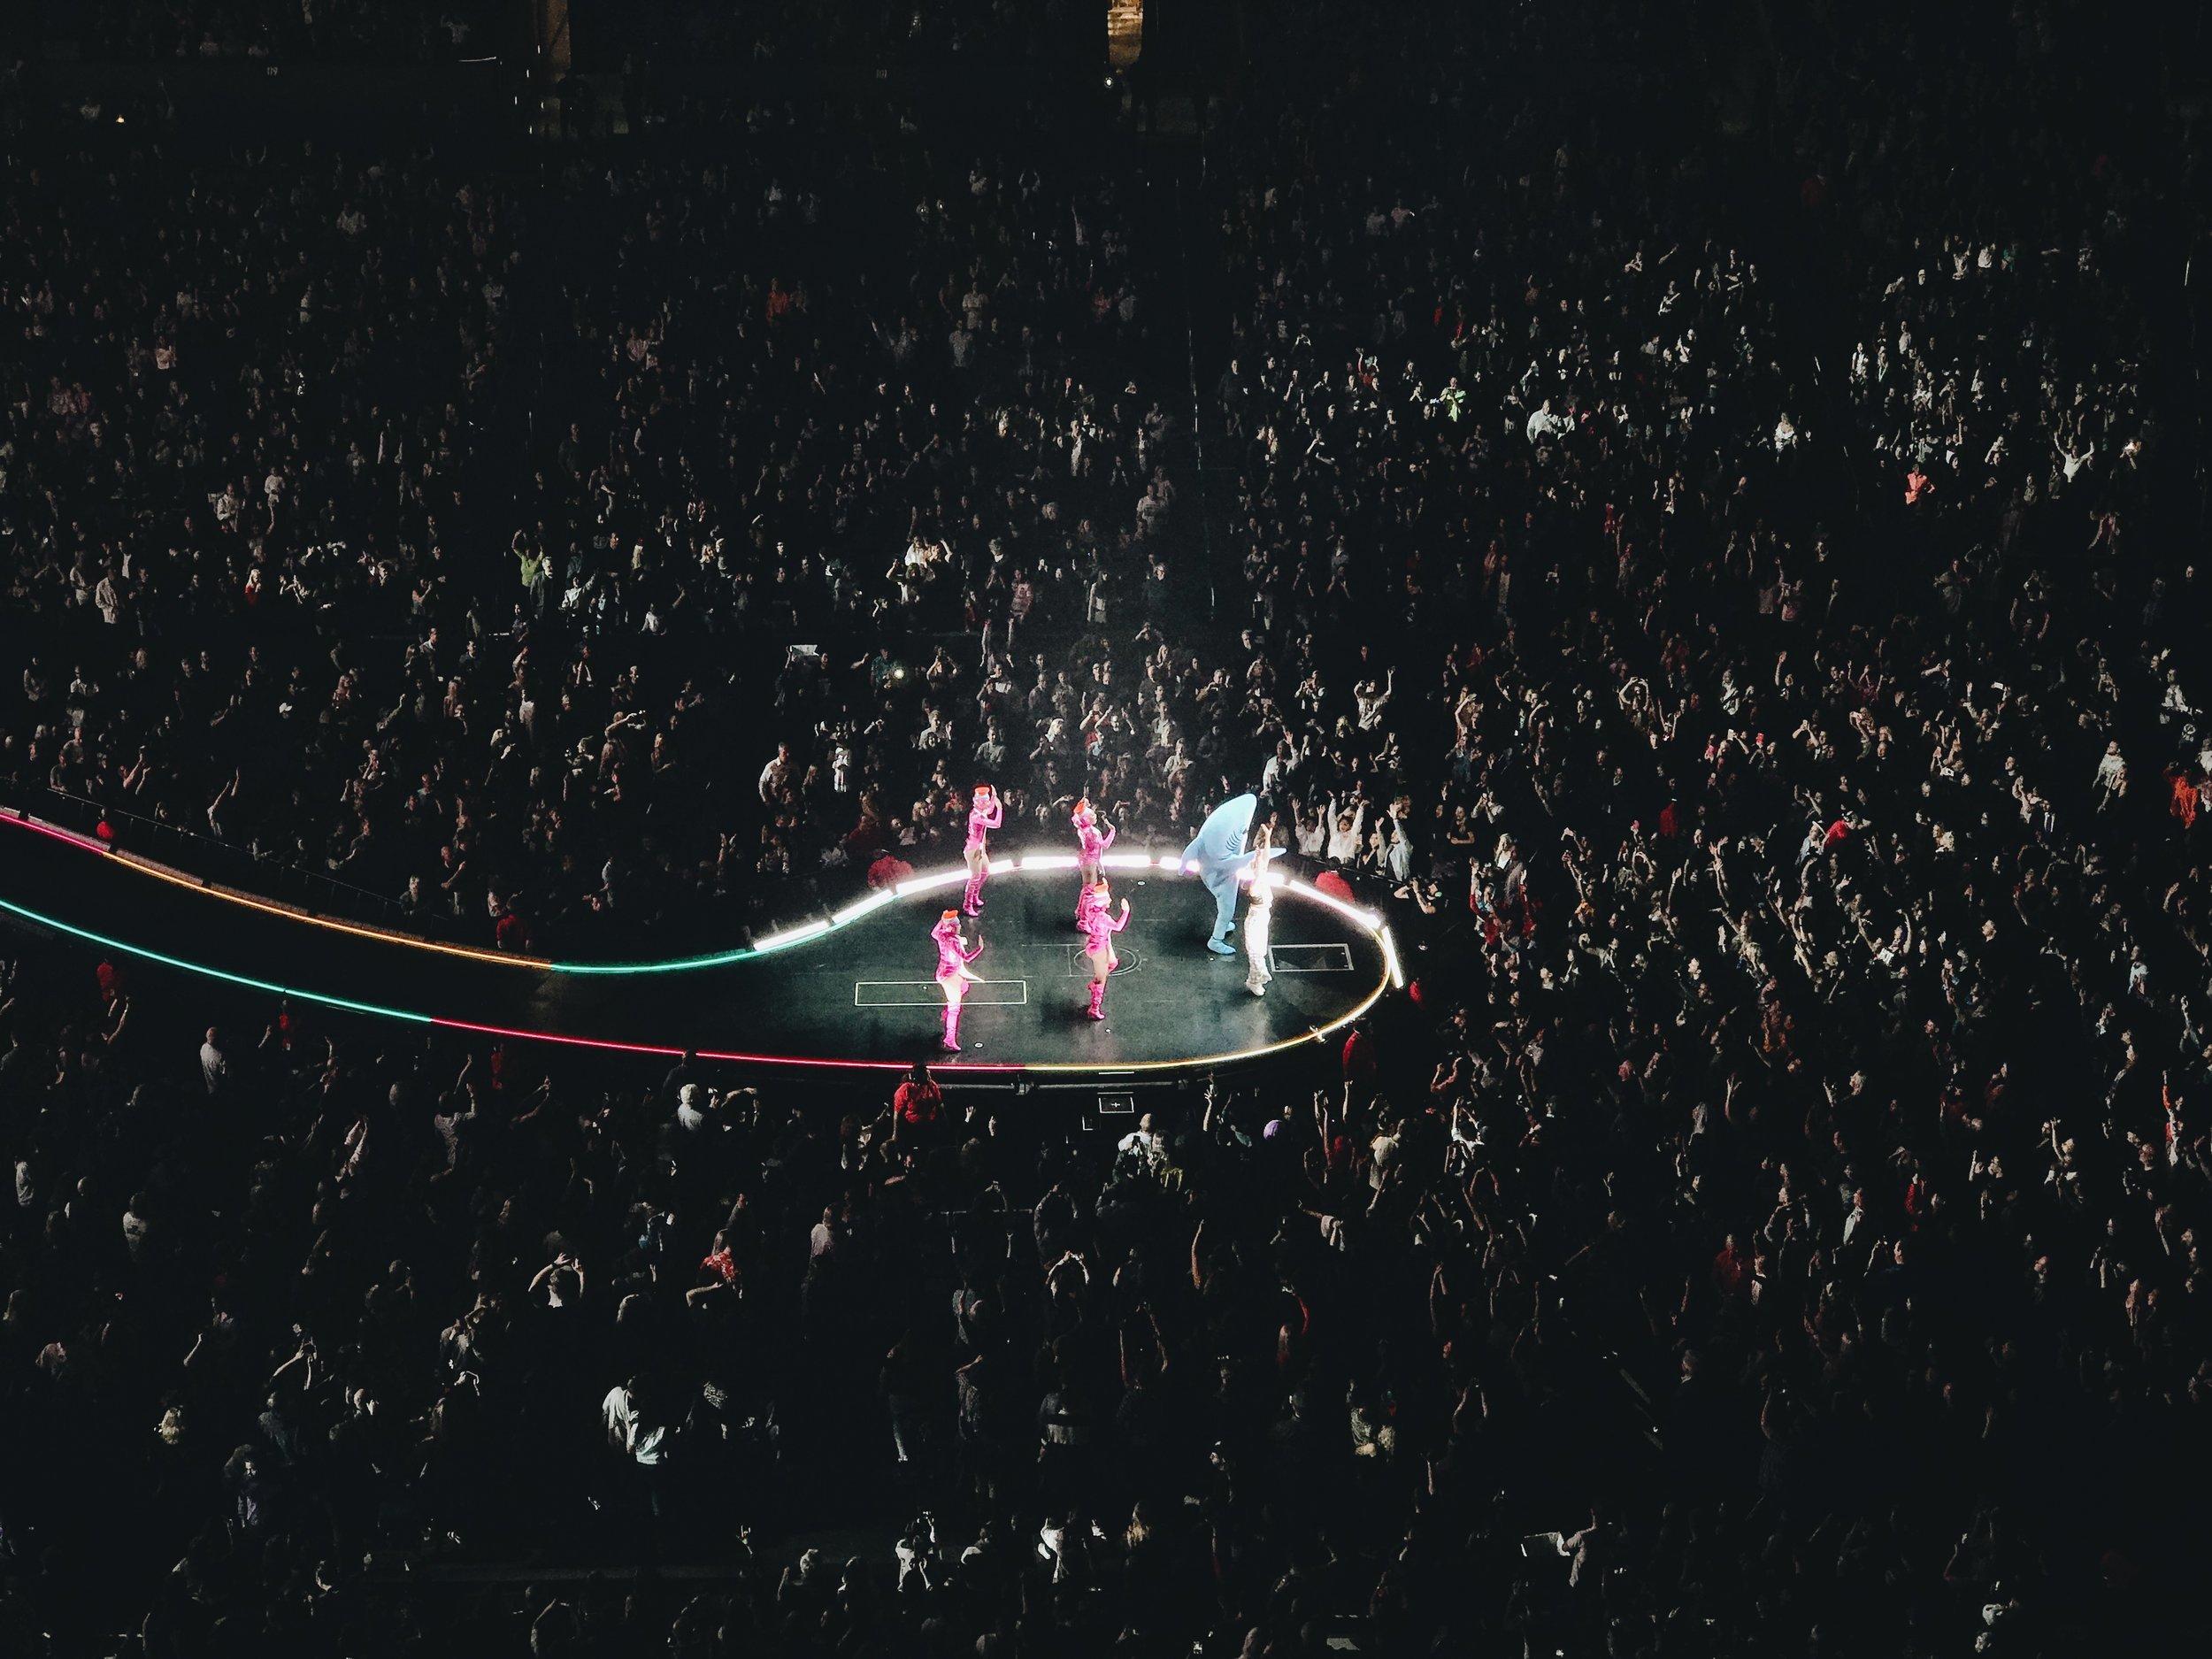 #314 Katy Perry.jpg